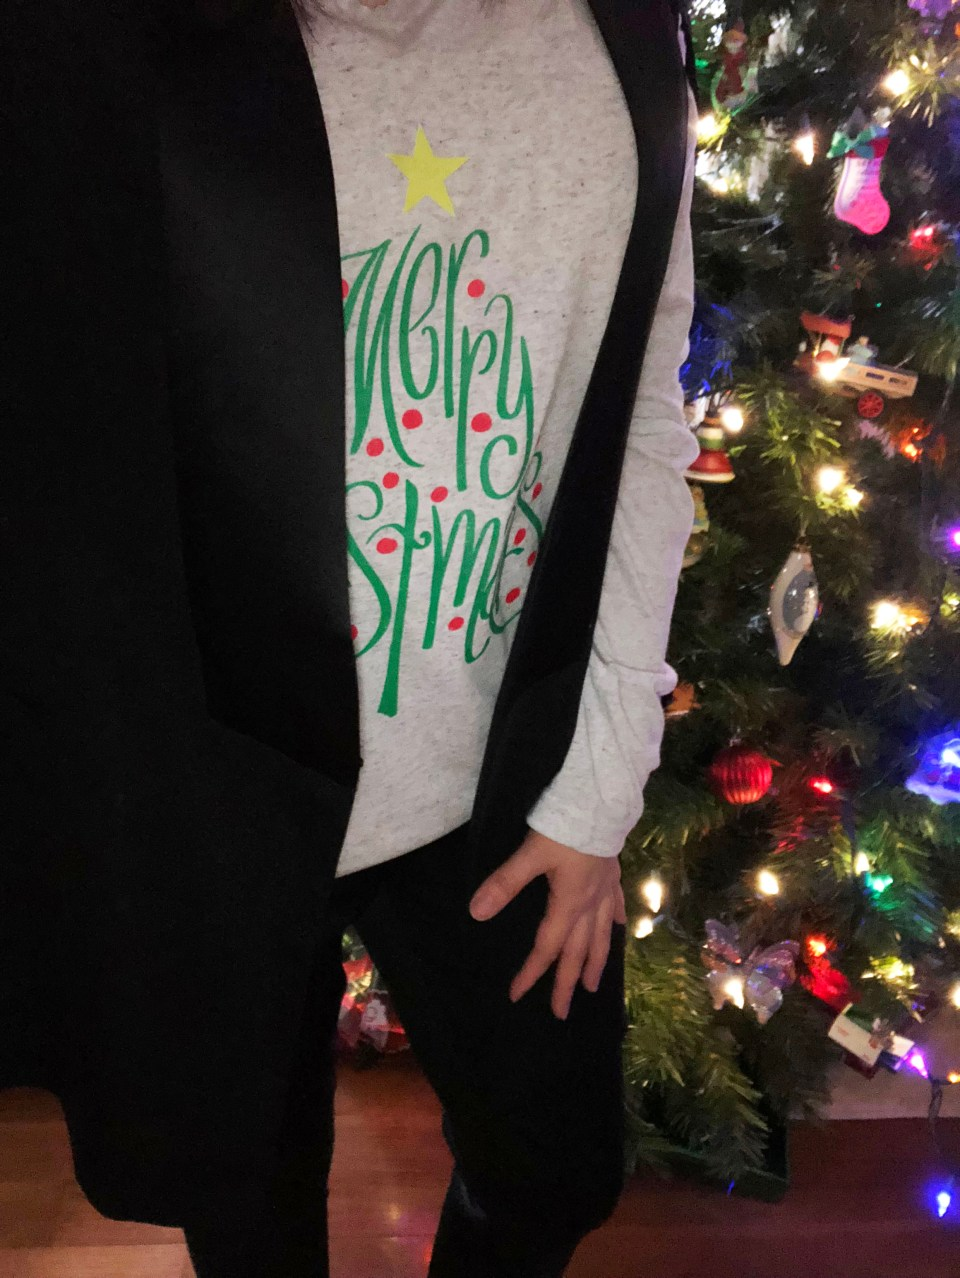 Merry Christmas tree tee + blazer cape